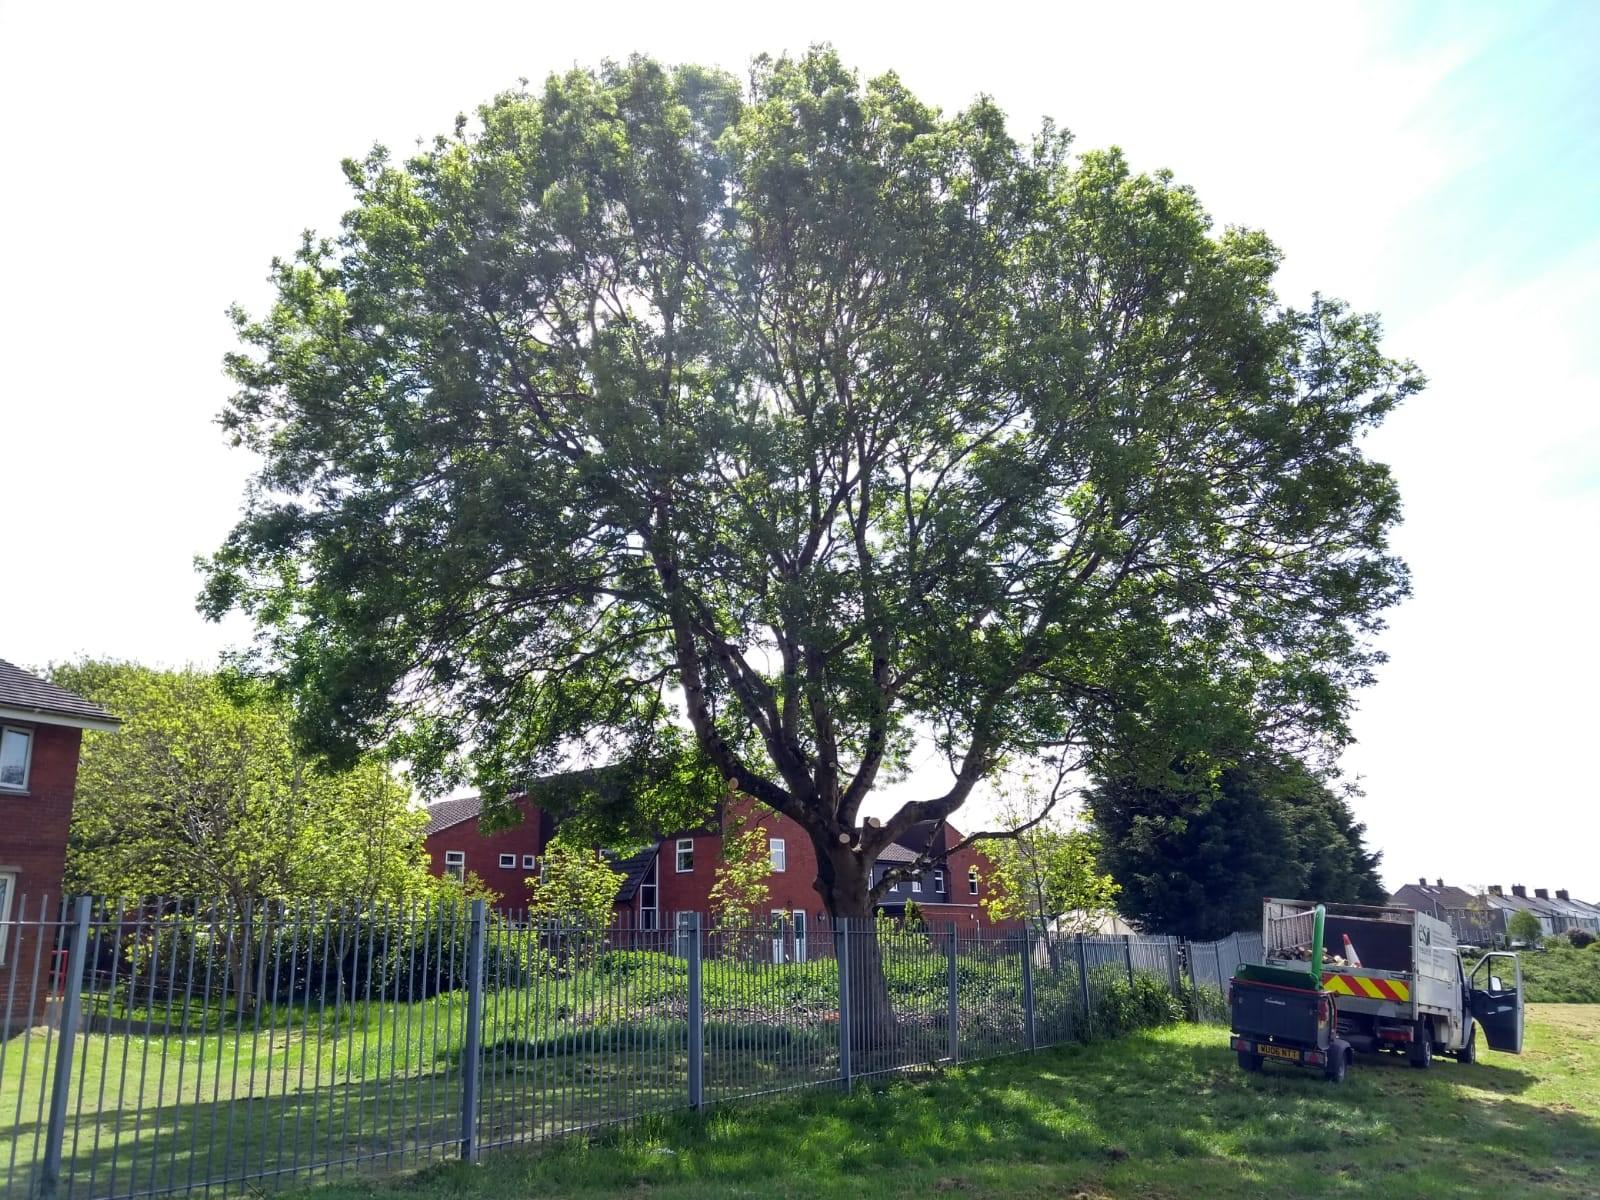 School tree after crownlift